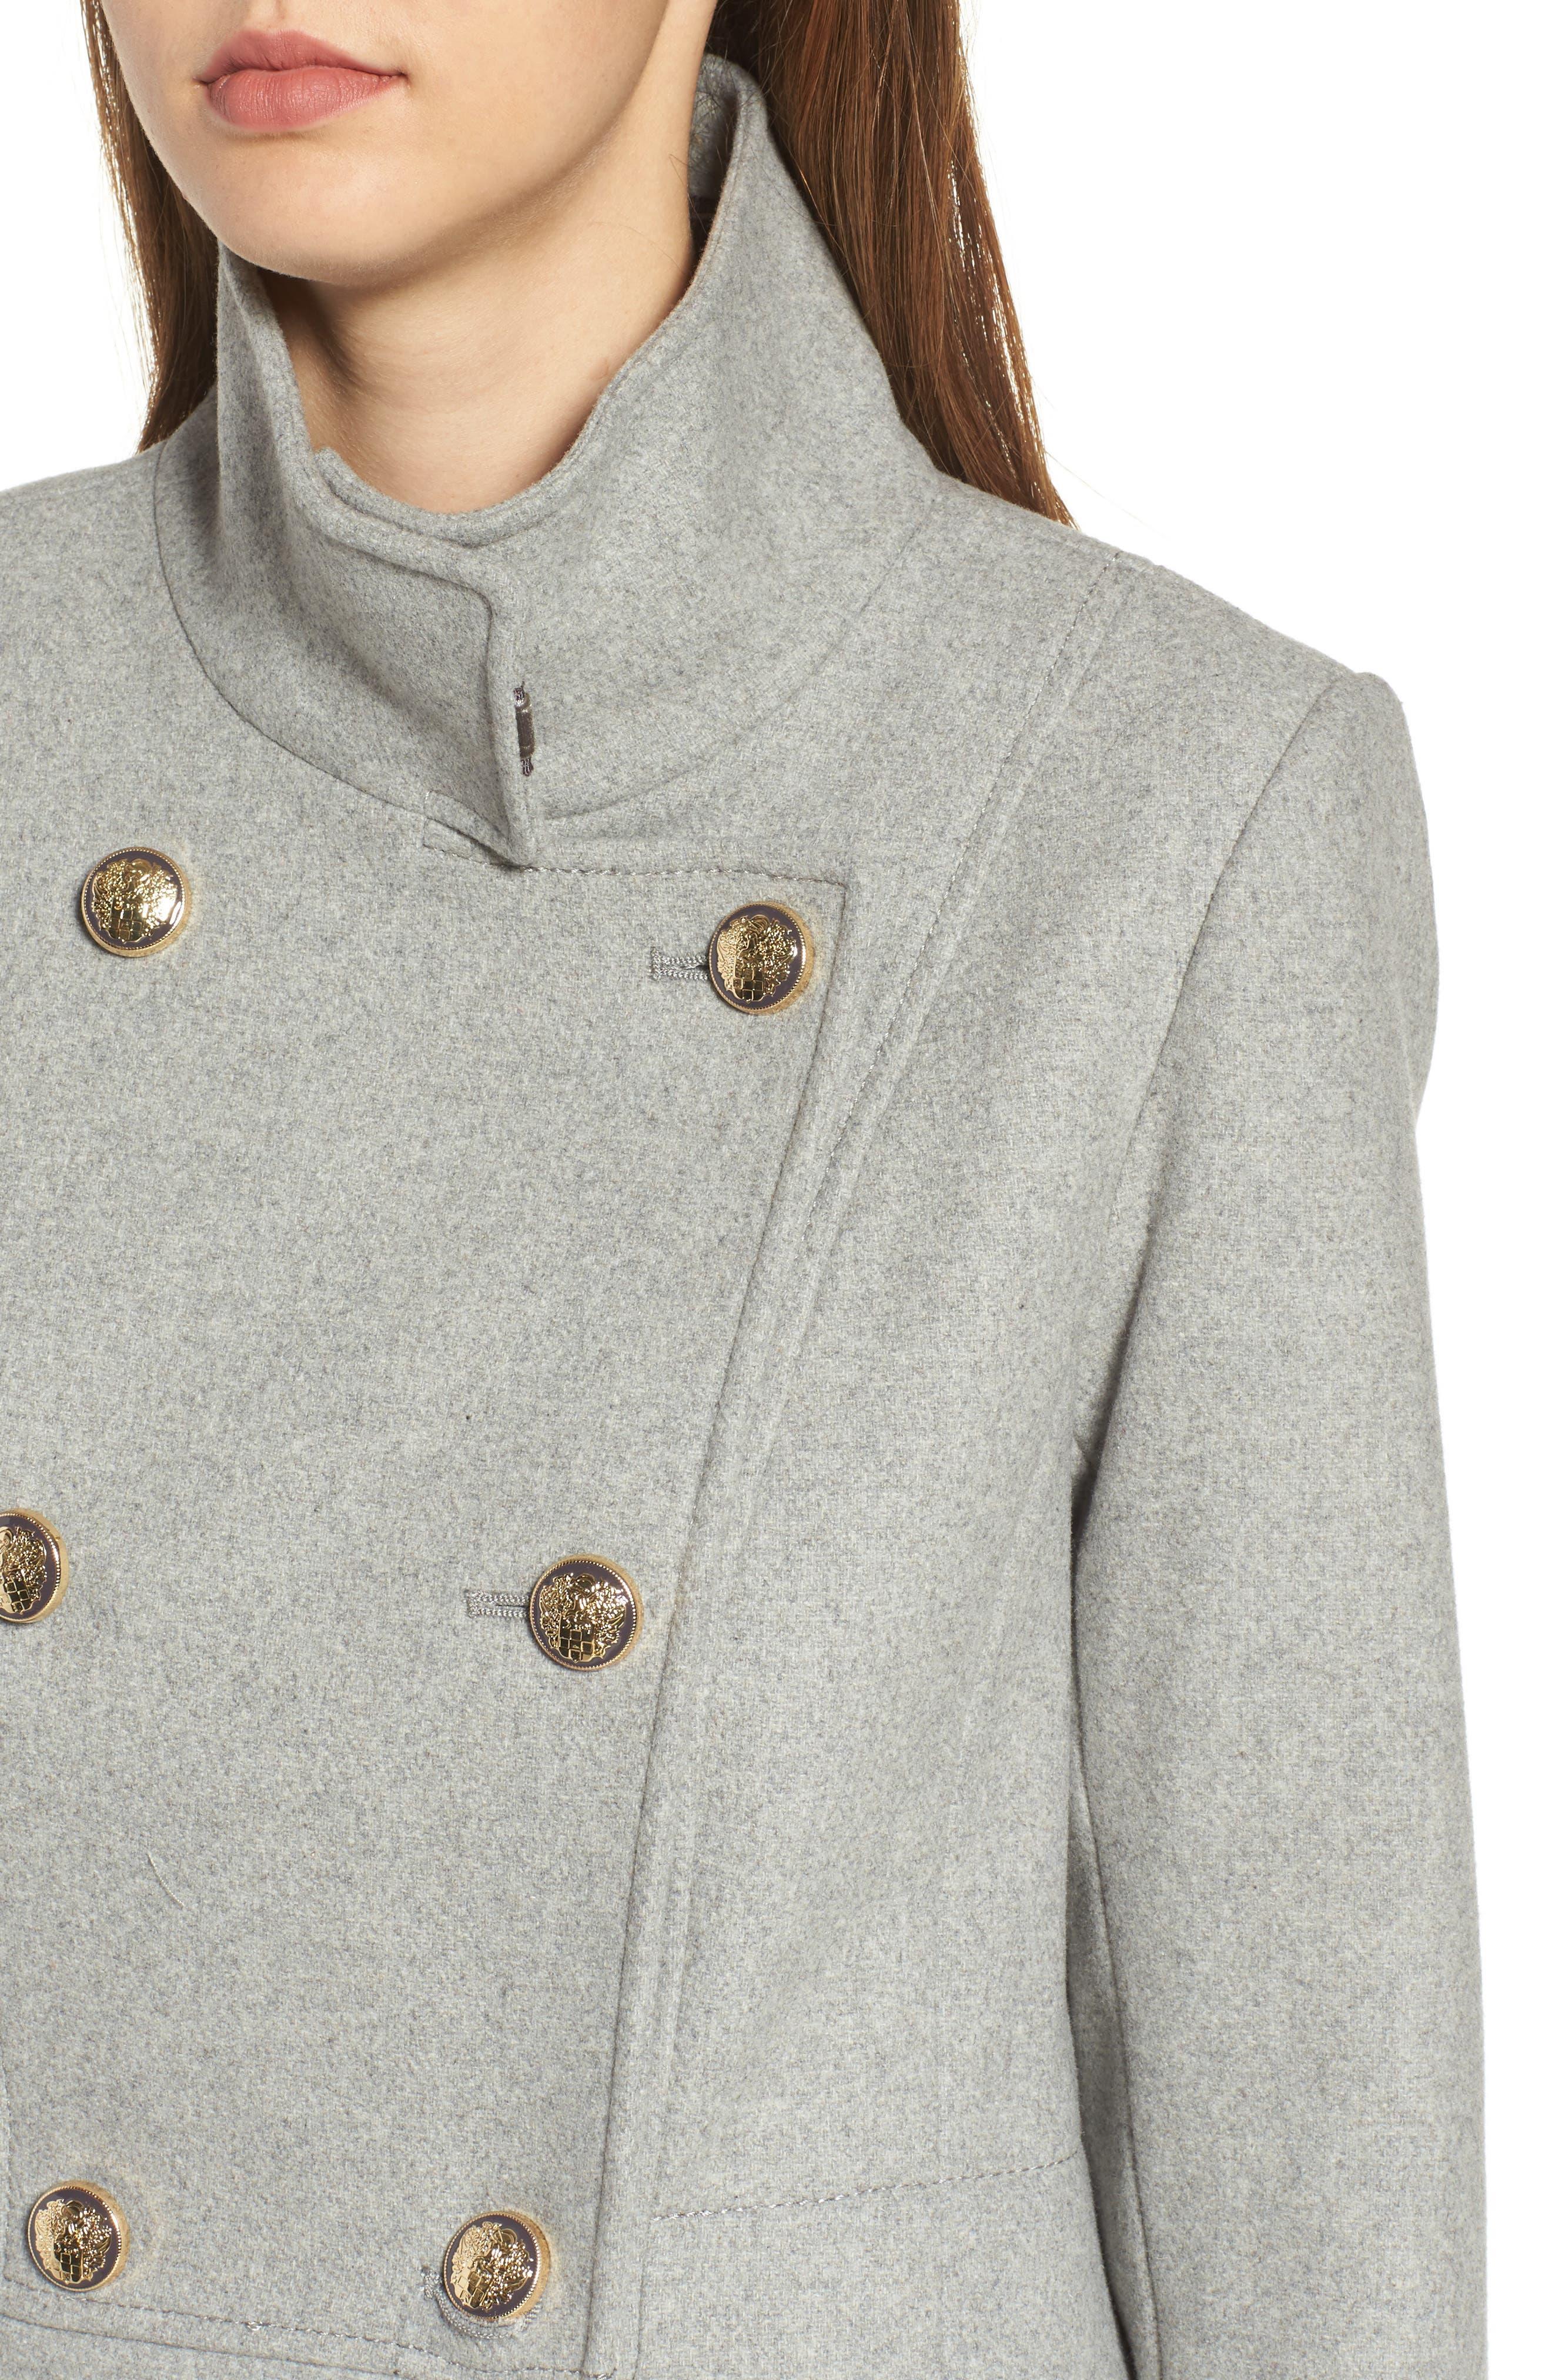 Wool Blend Military Coat,                             Alternate thumbnail 4, color,                             Light Grey